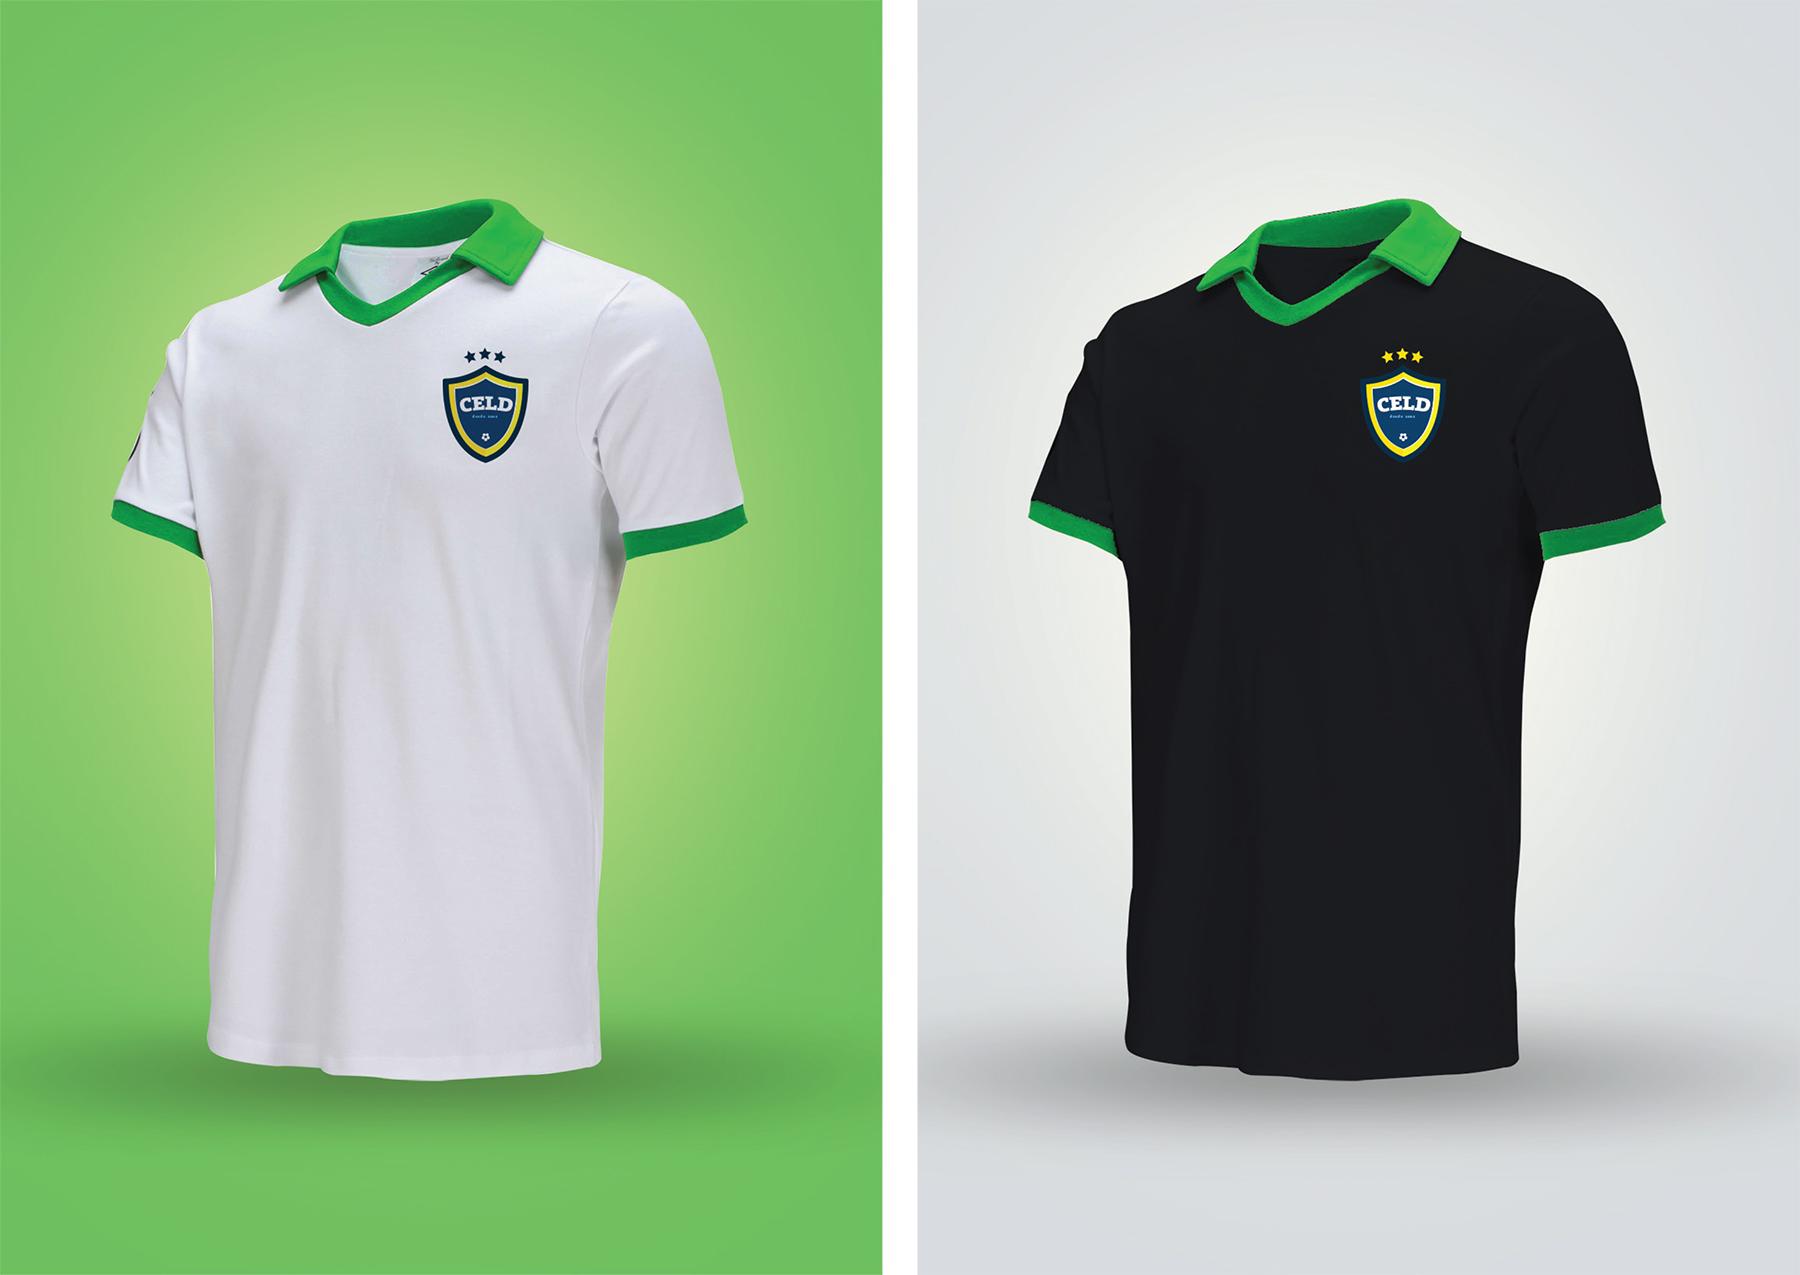 Inteligencia Marketing - CELD – NOVA IDENTIDADE - camisas